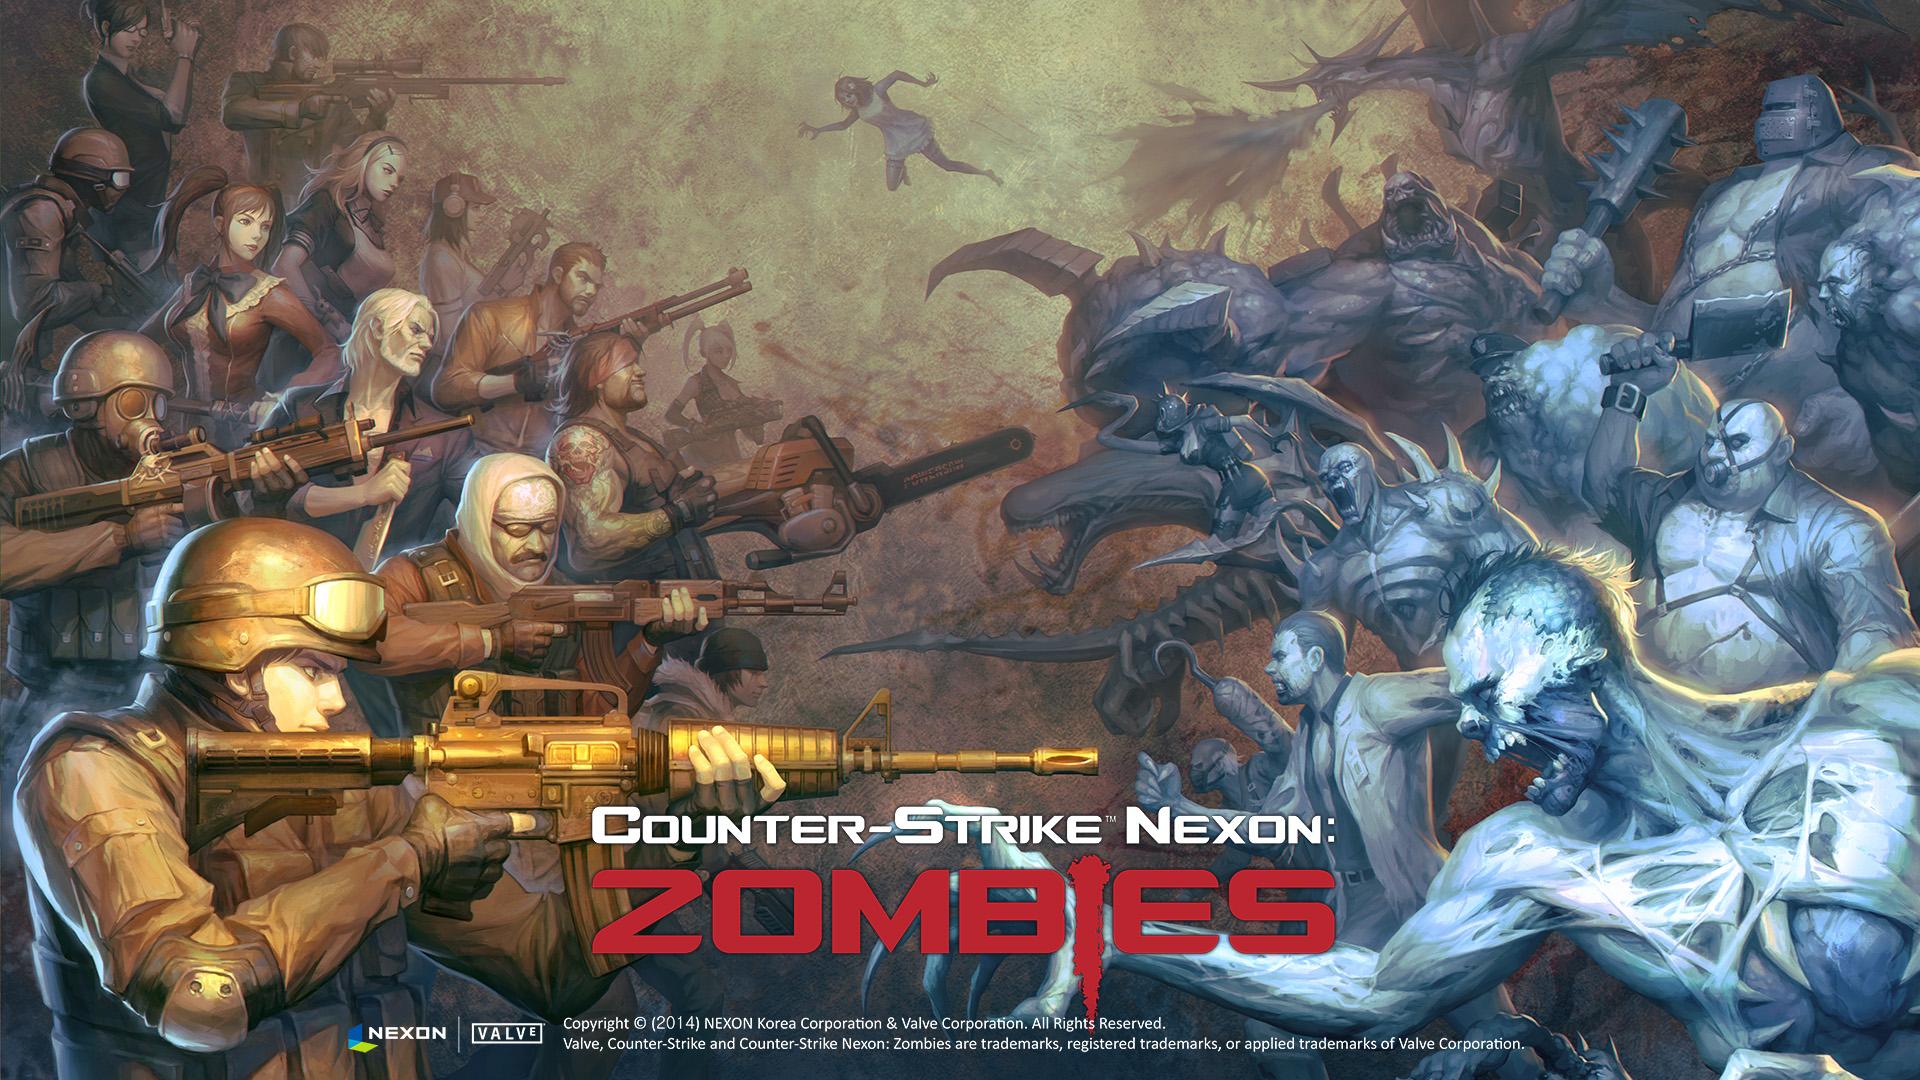 CounterStrike Nexon Zombies